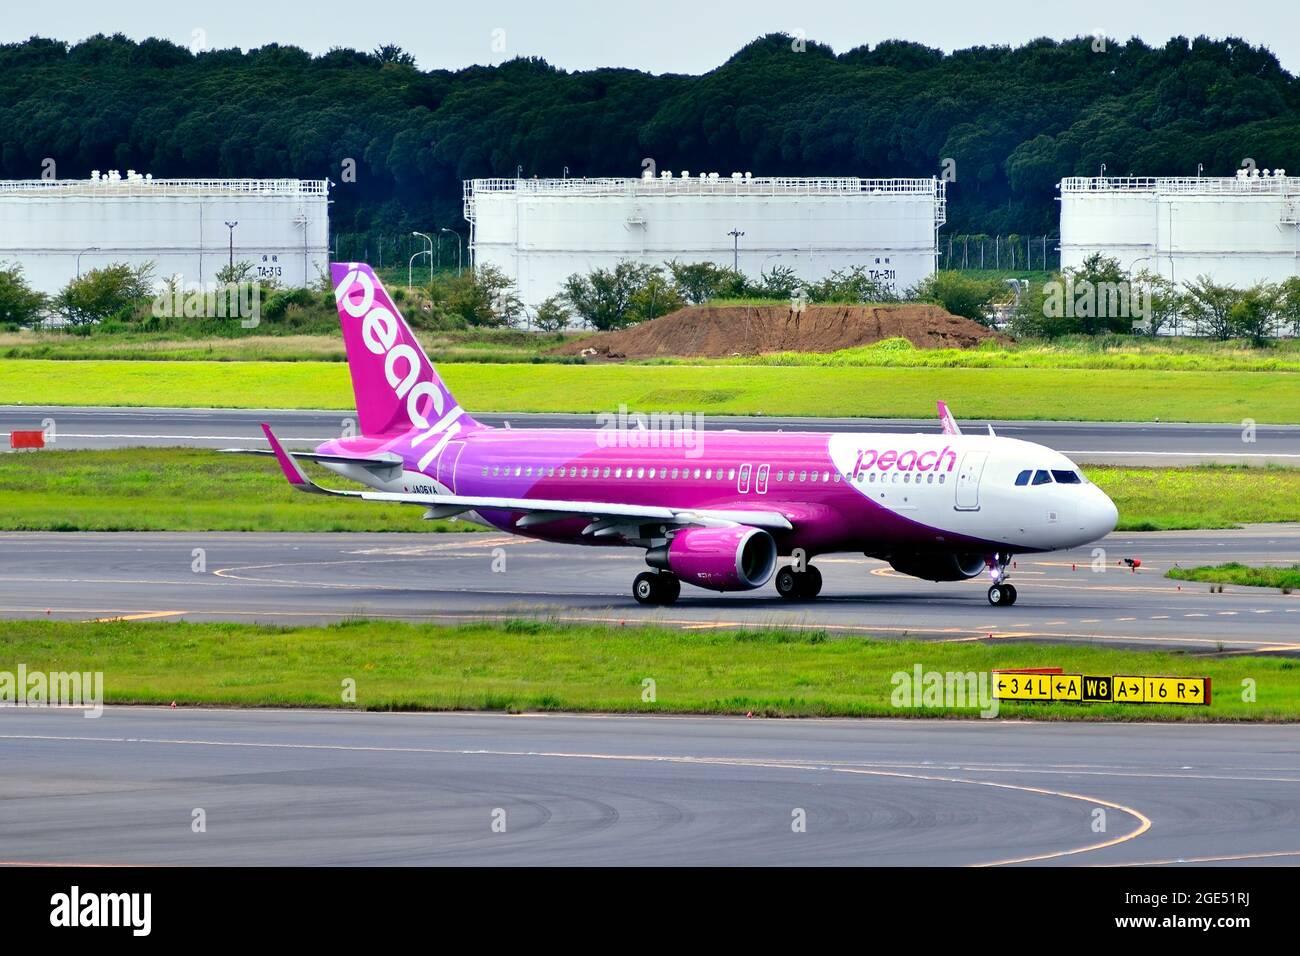 Peach Aviation, Airbus, A320 CEO, WL, JA06VA, Taxi to TO, Tokyo Narita Airport, Chiba, Japan Stock Photo